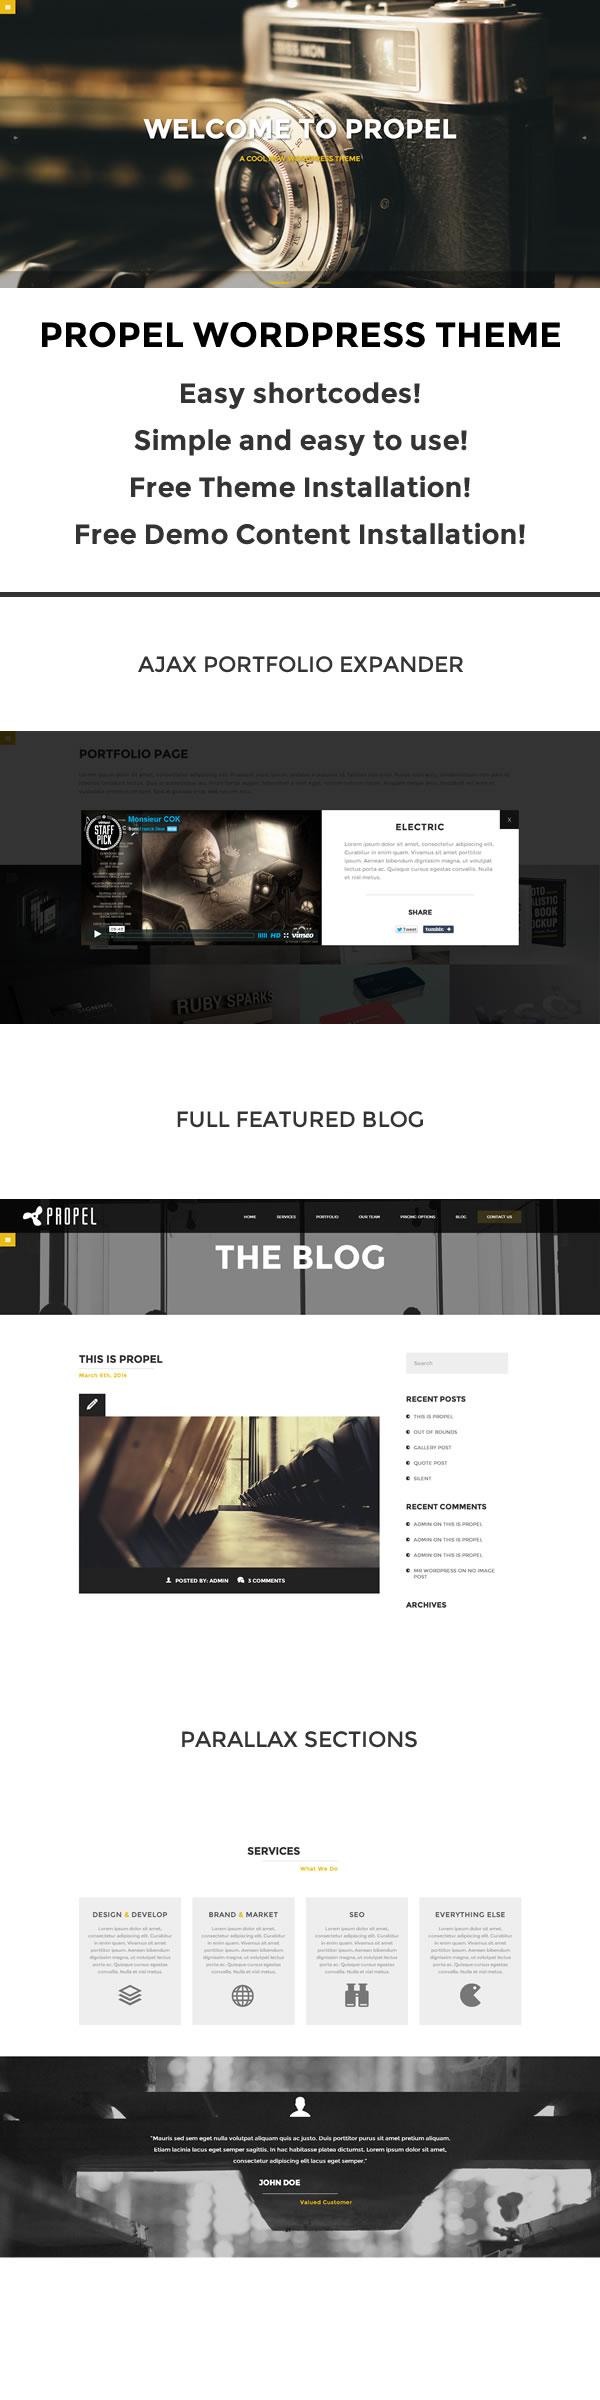 Propel WordPress Theme